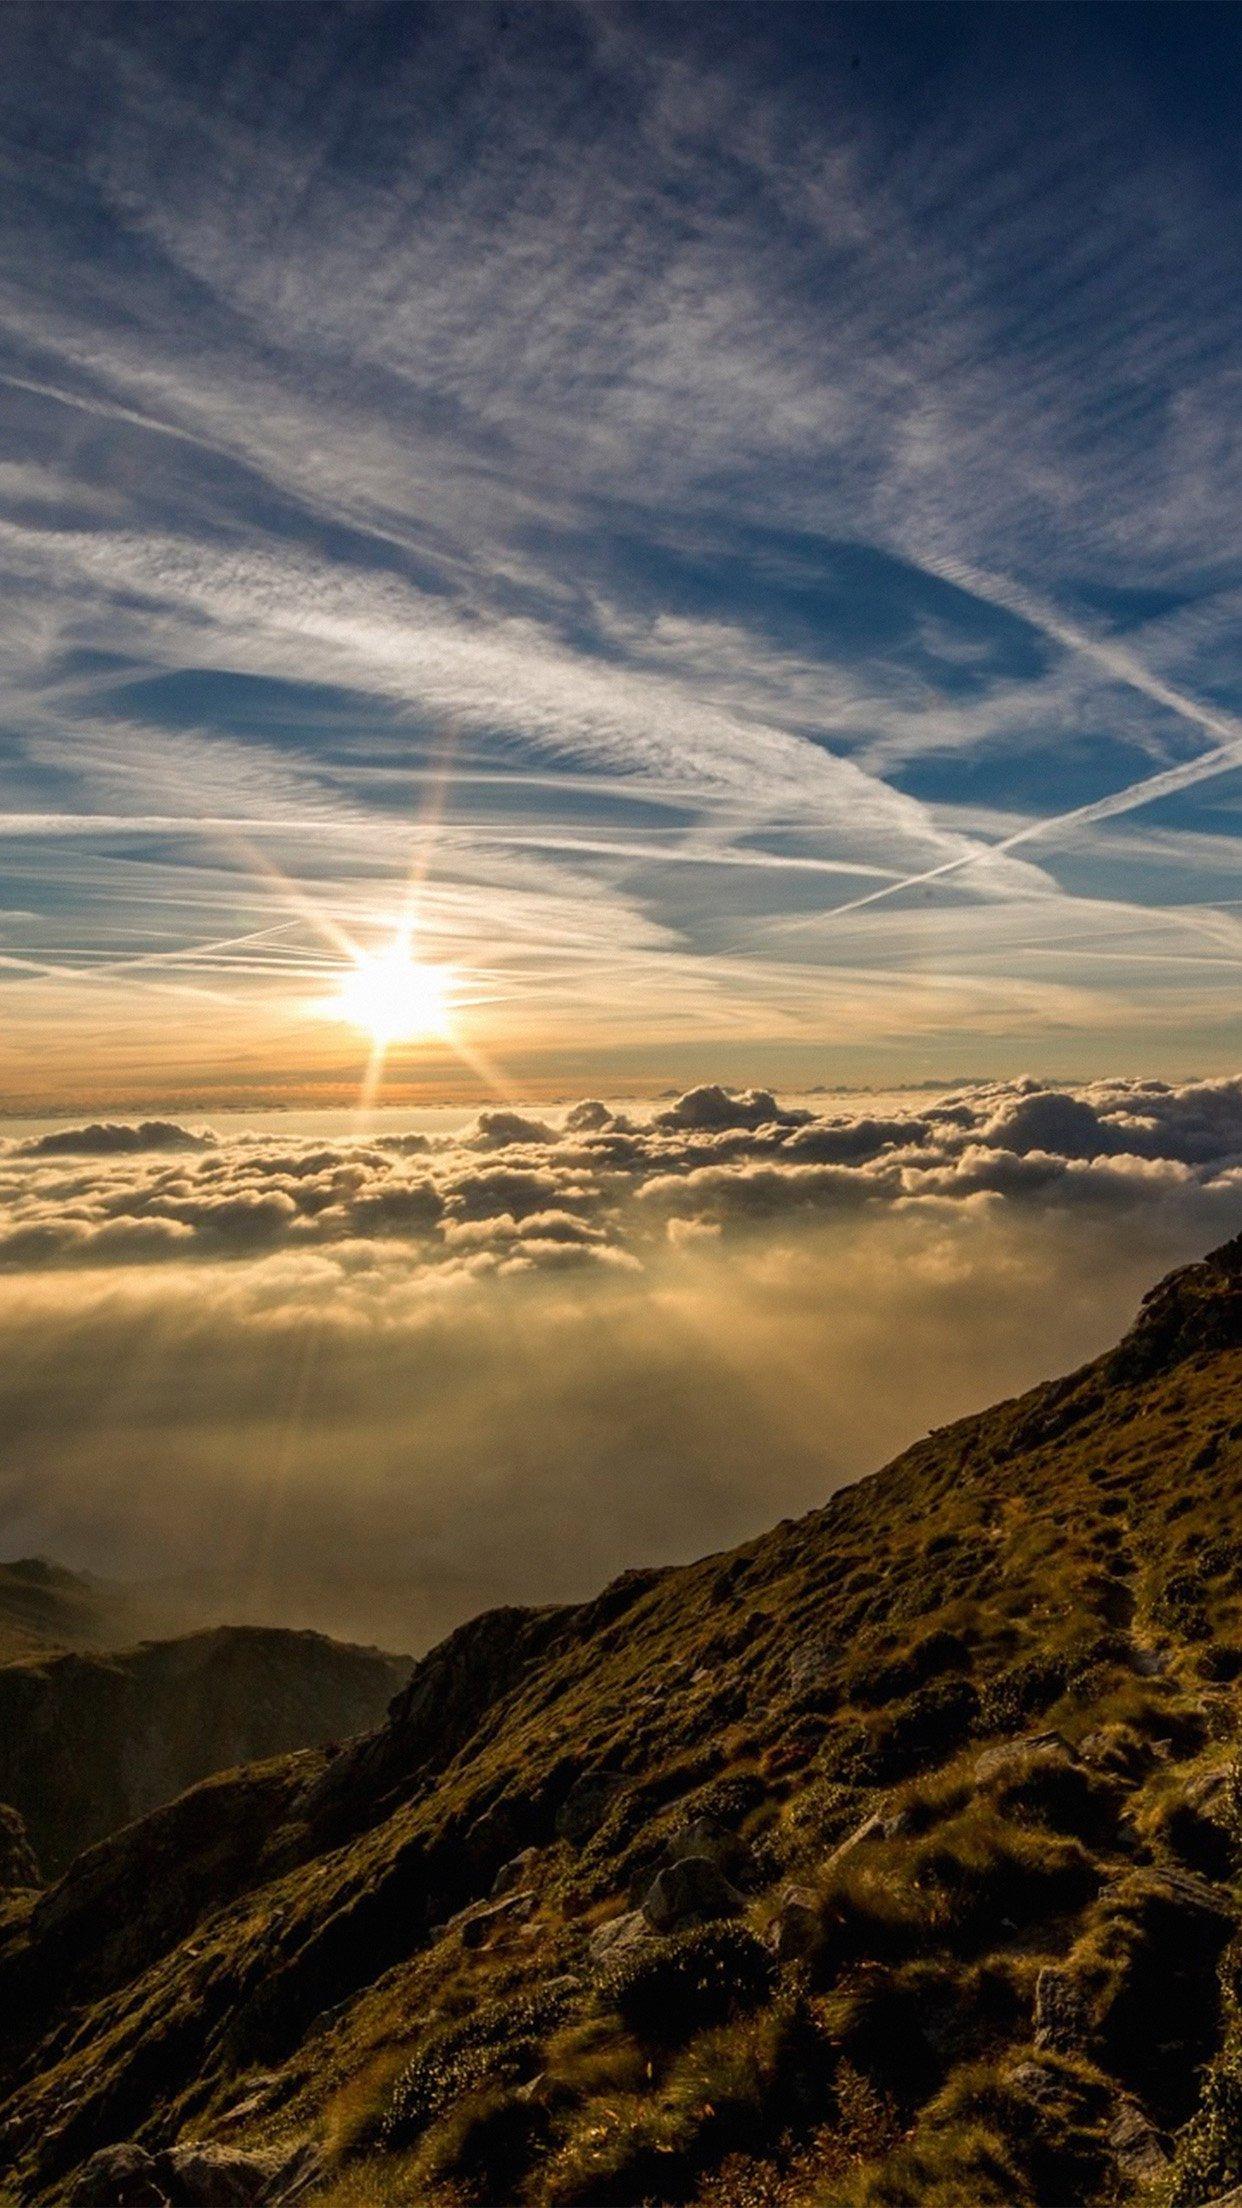 Good Wallpaper Mountain Morning - Morning-Mountain-Sky-Nature-Shine  Pictures_52448.jpg